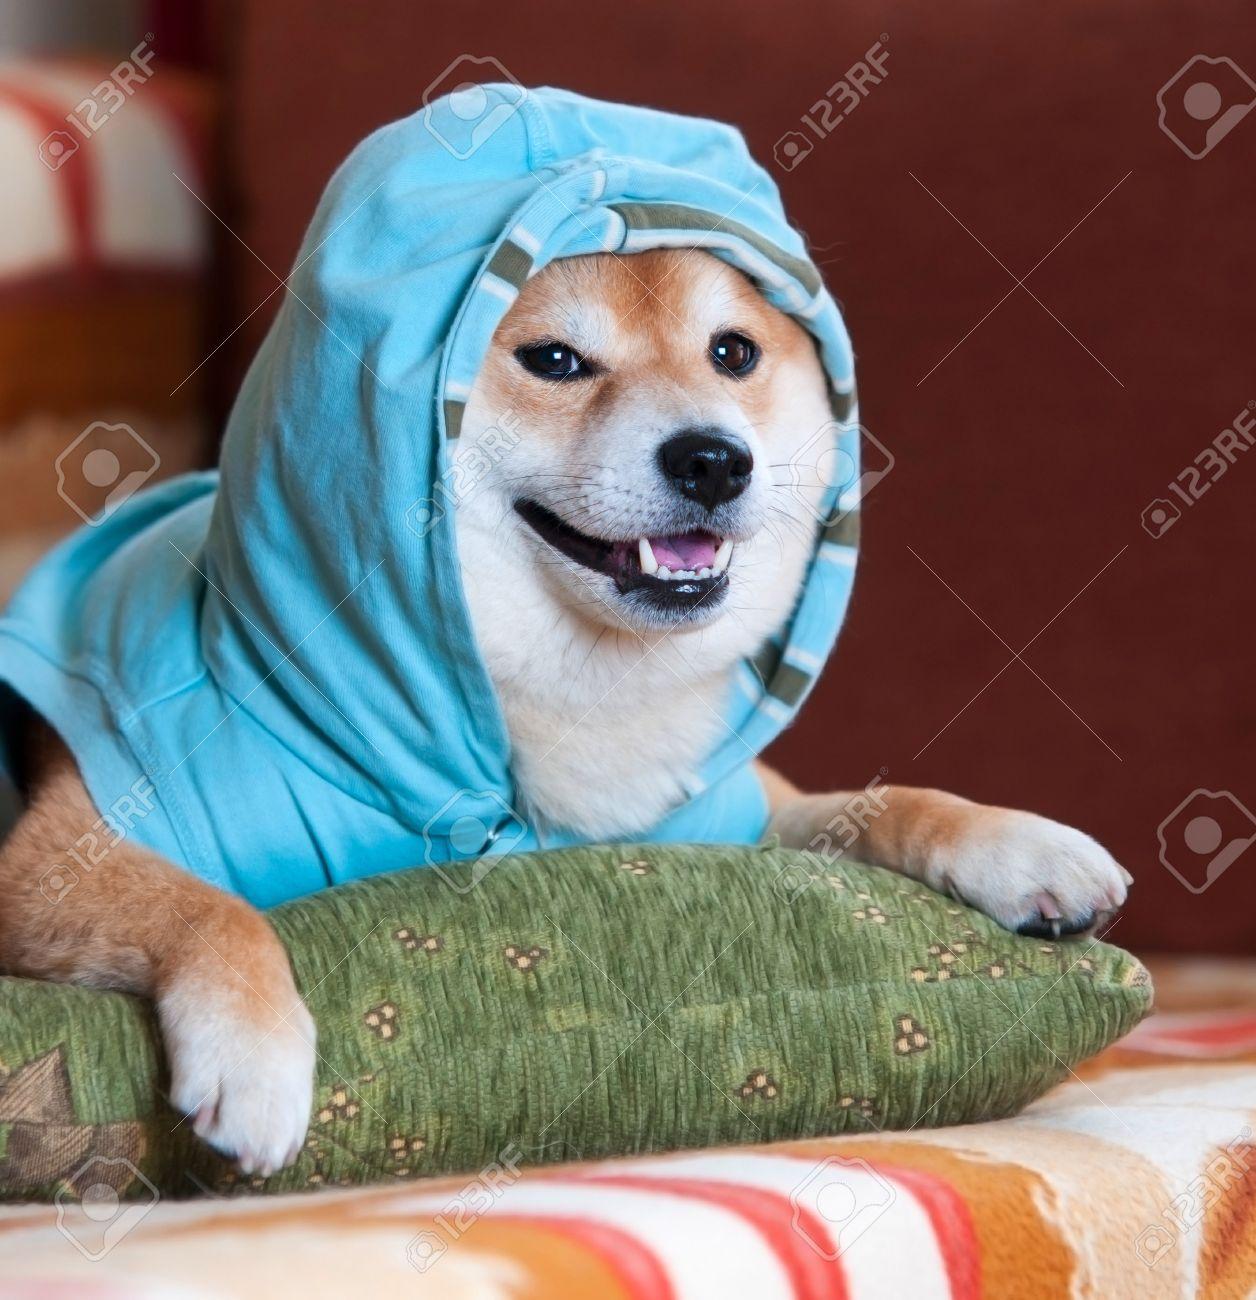 happy shiba inu dog with blue jacket on pillow